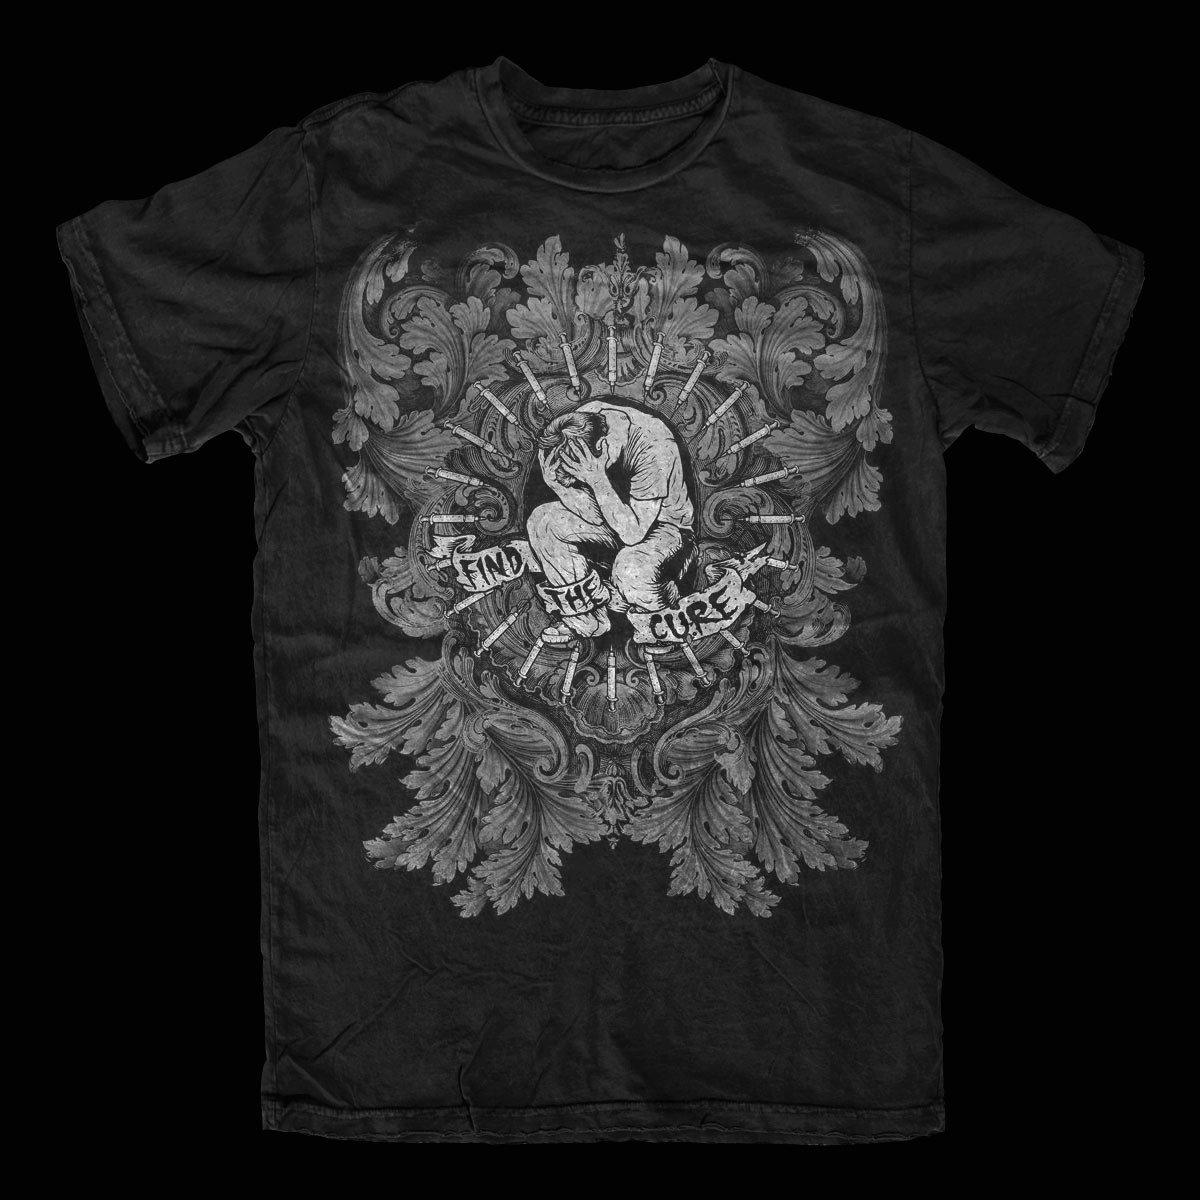 Cure Apparel – T-Shirt Design